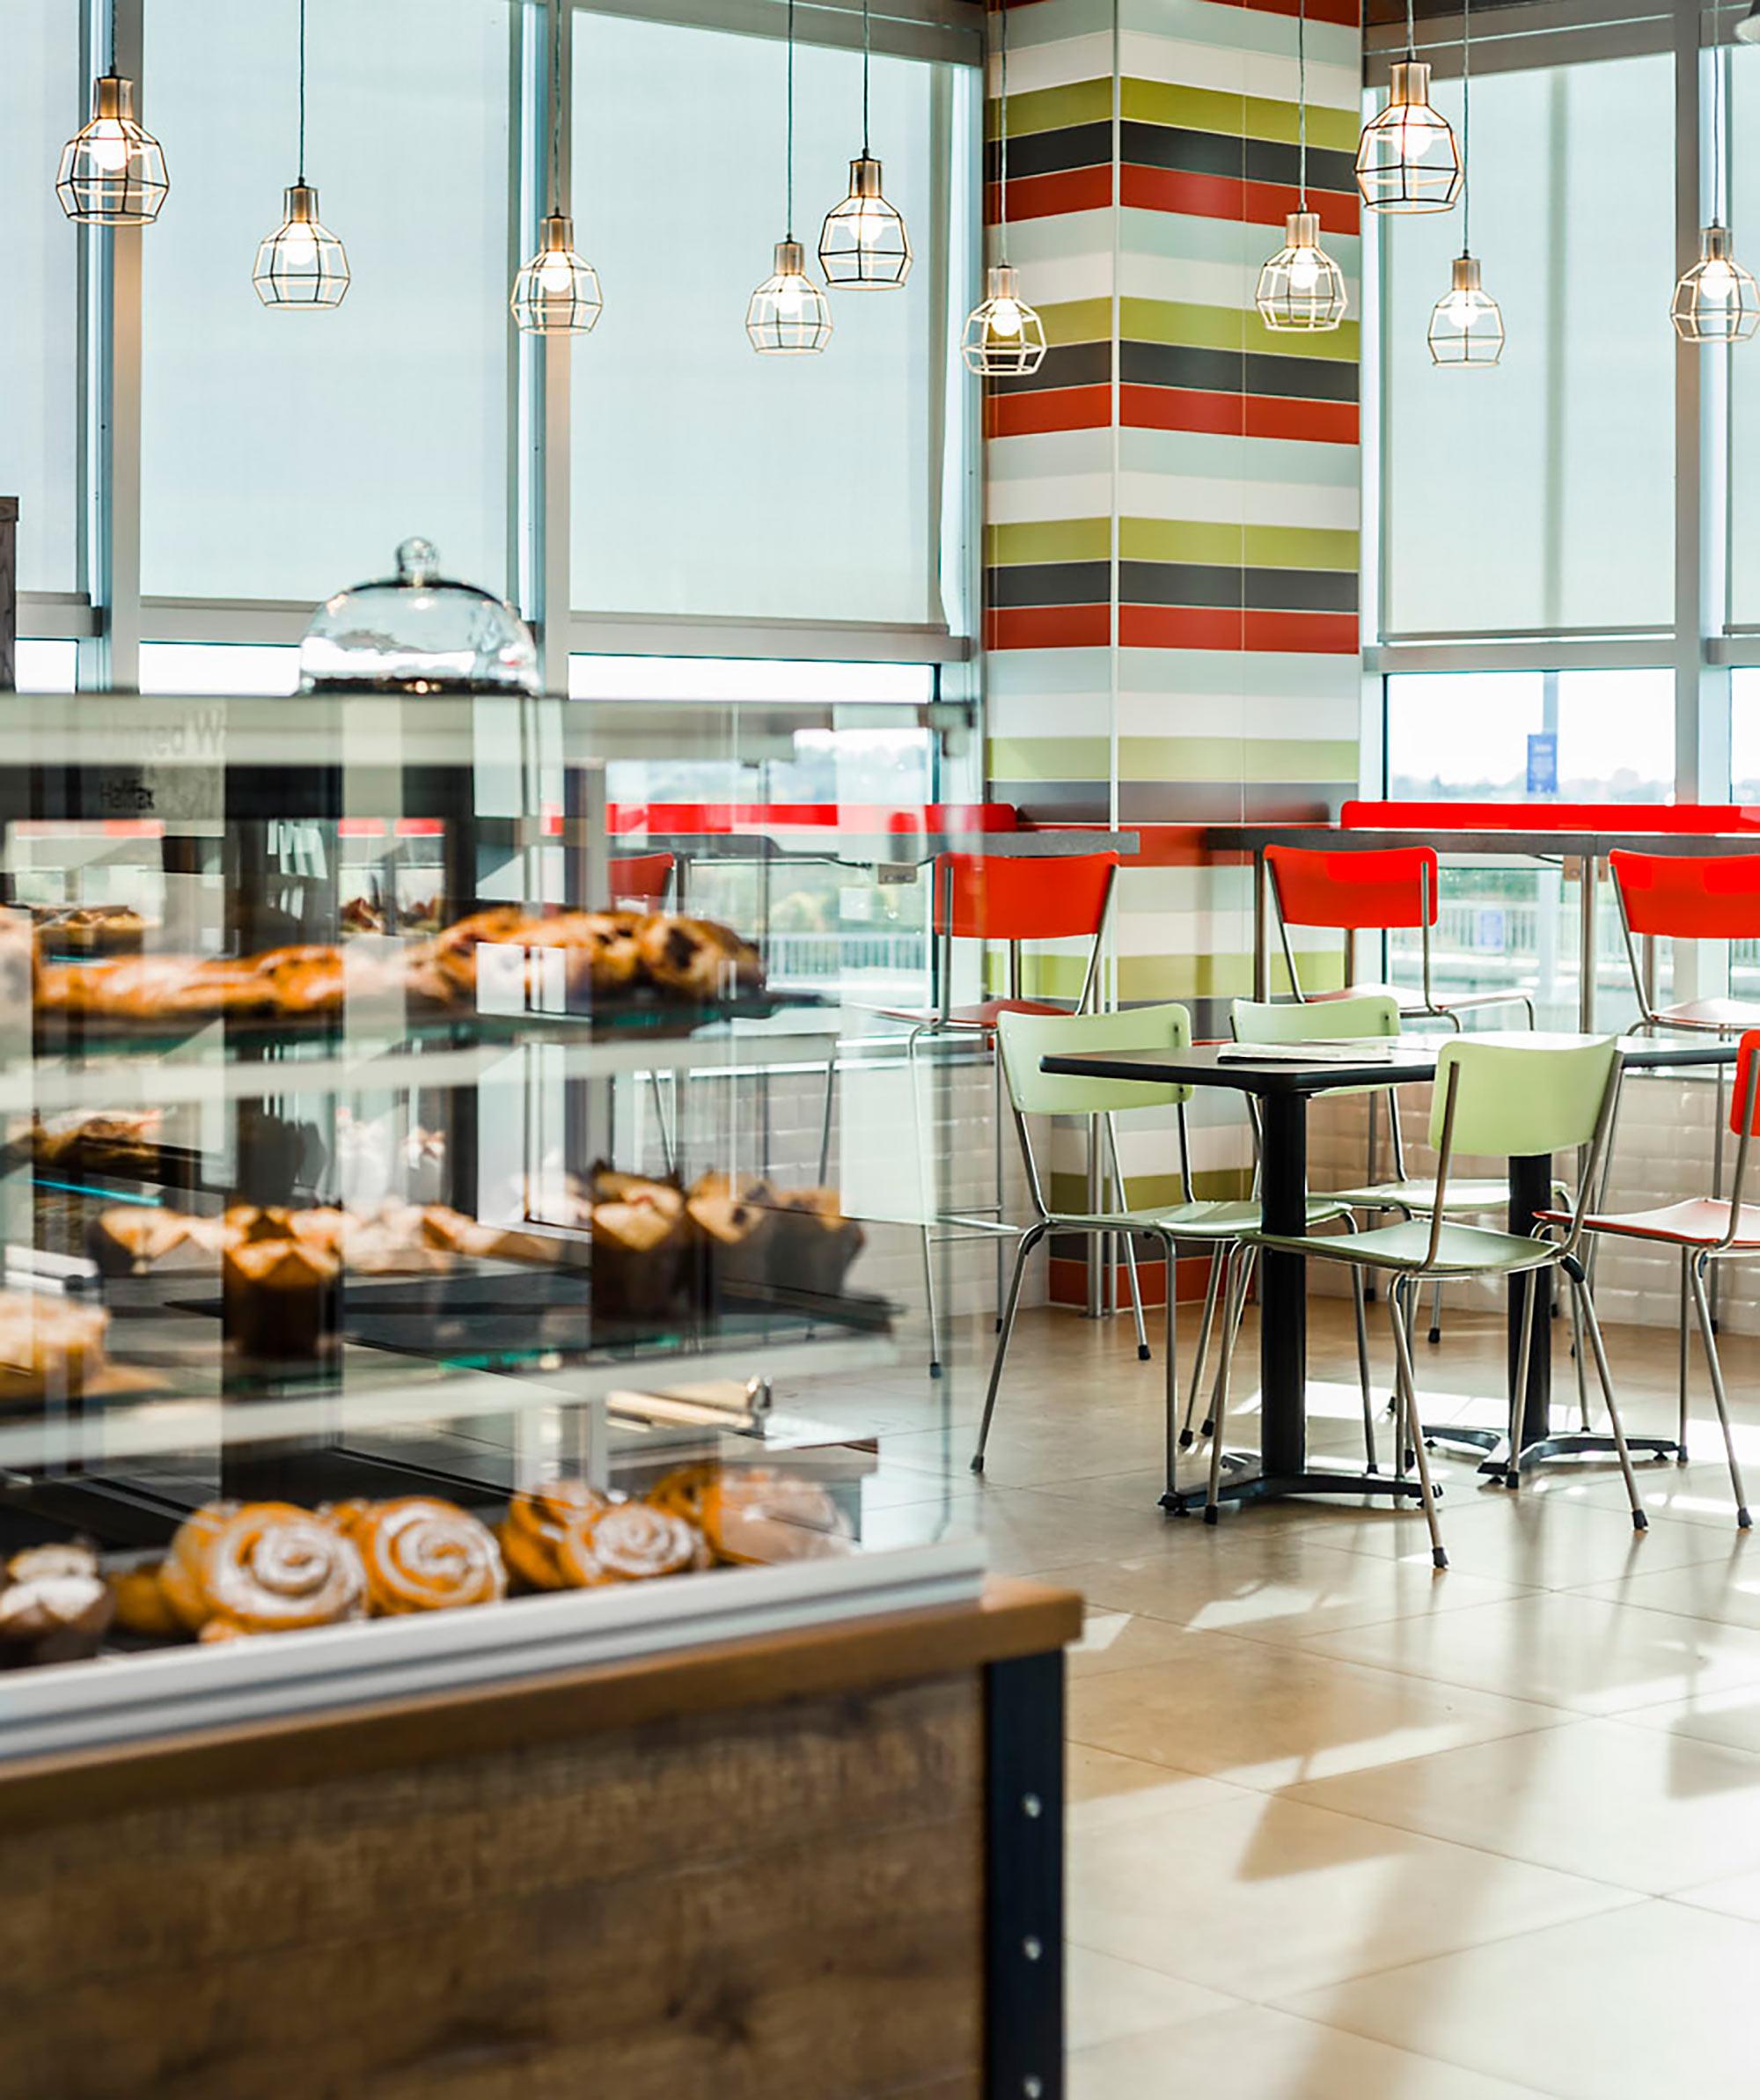 interior-design-cafe-seating-tables.jpg